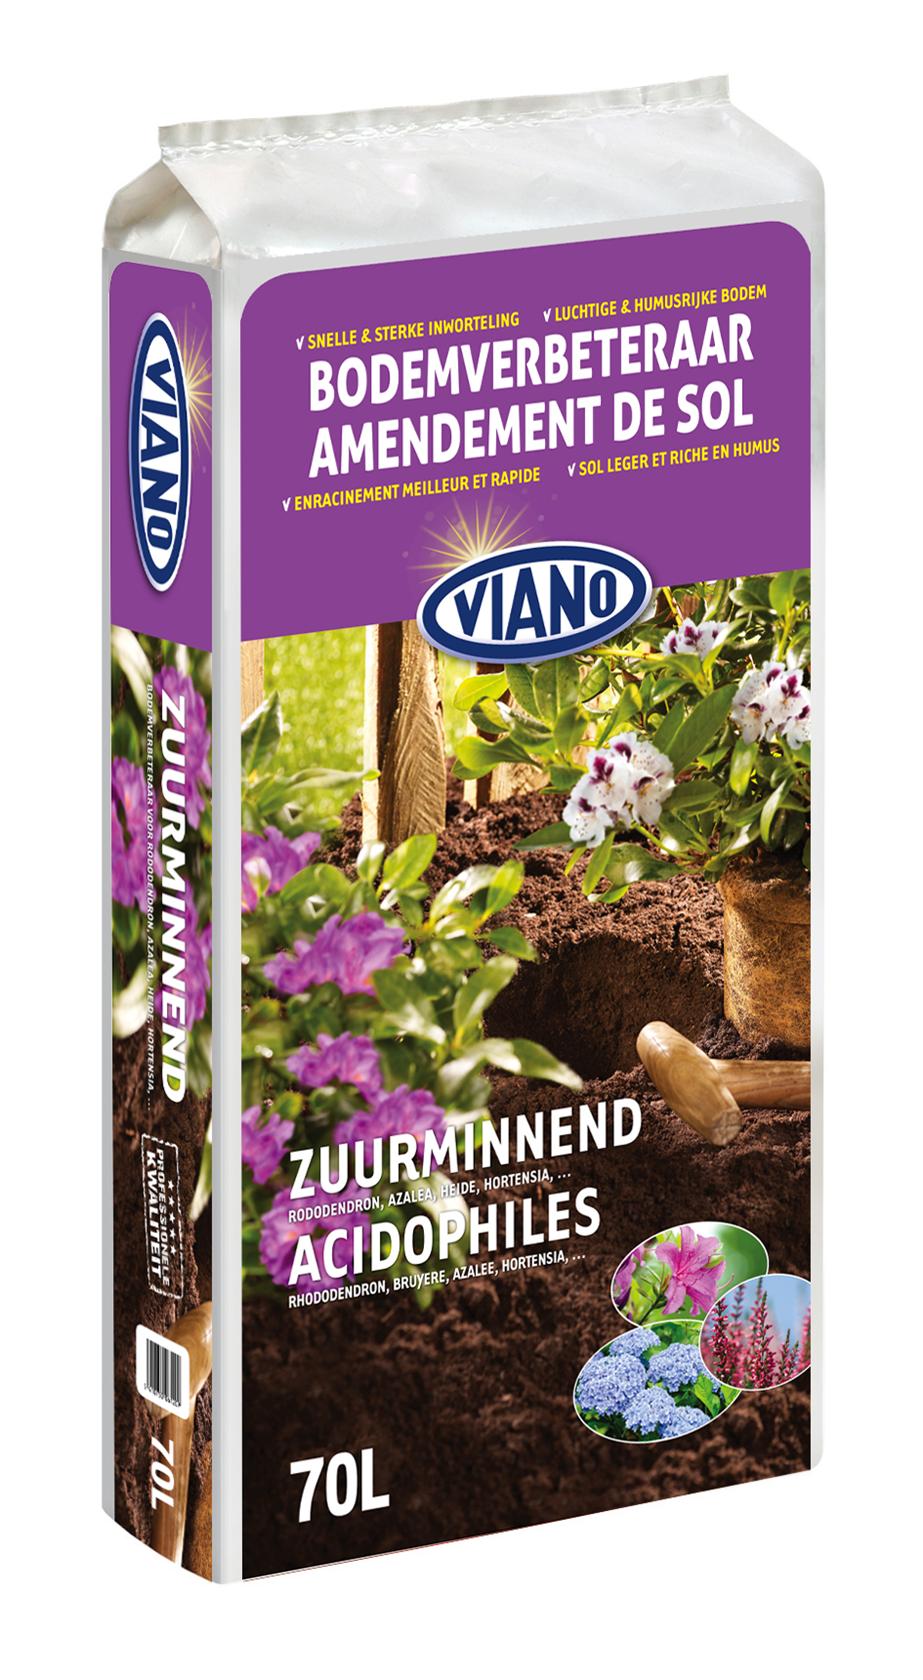 Rododendrons en Zuurminnende planten bodemverbeteraar 70L